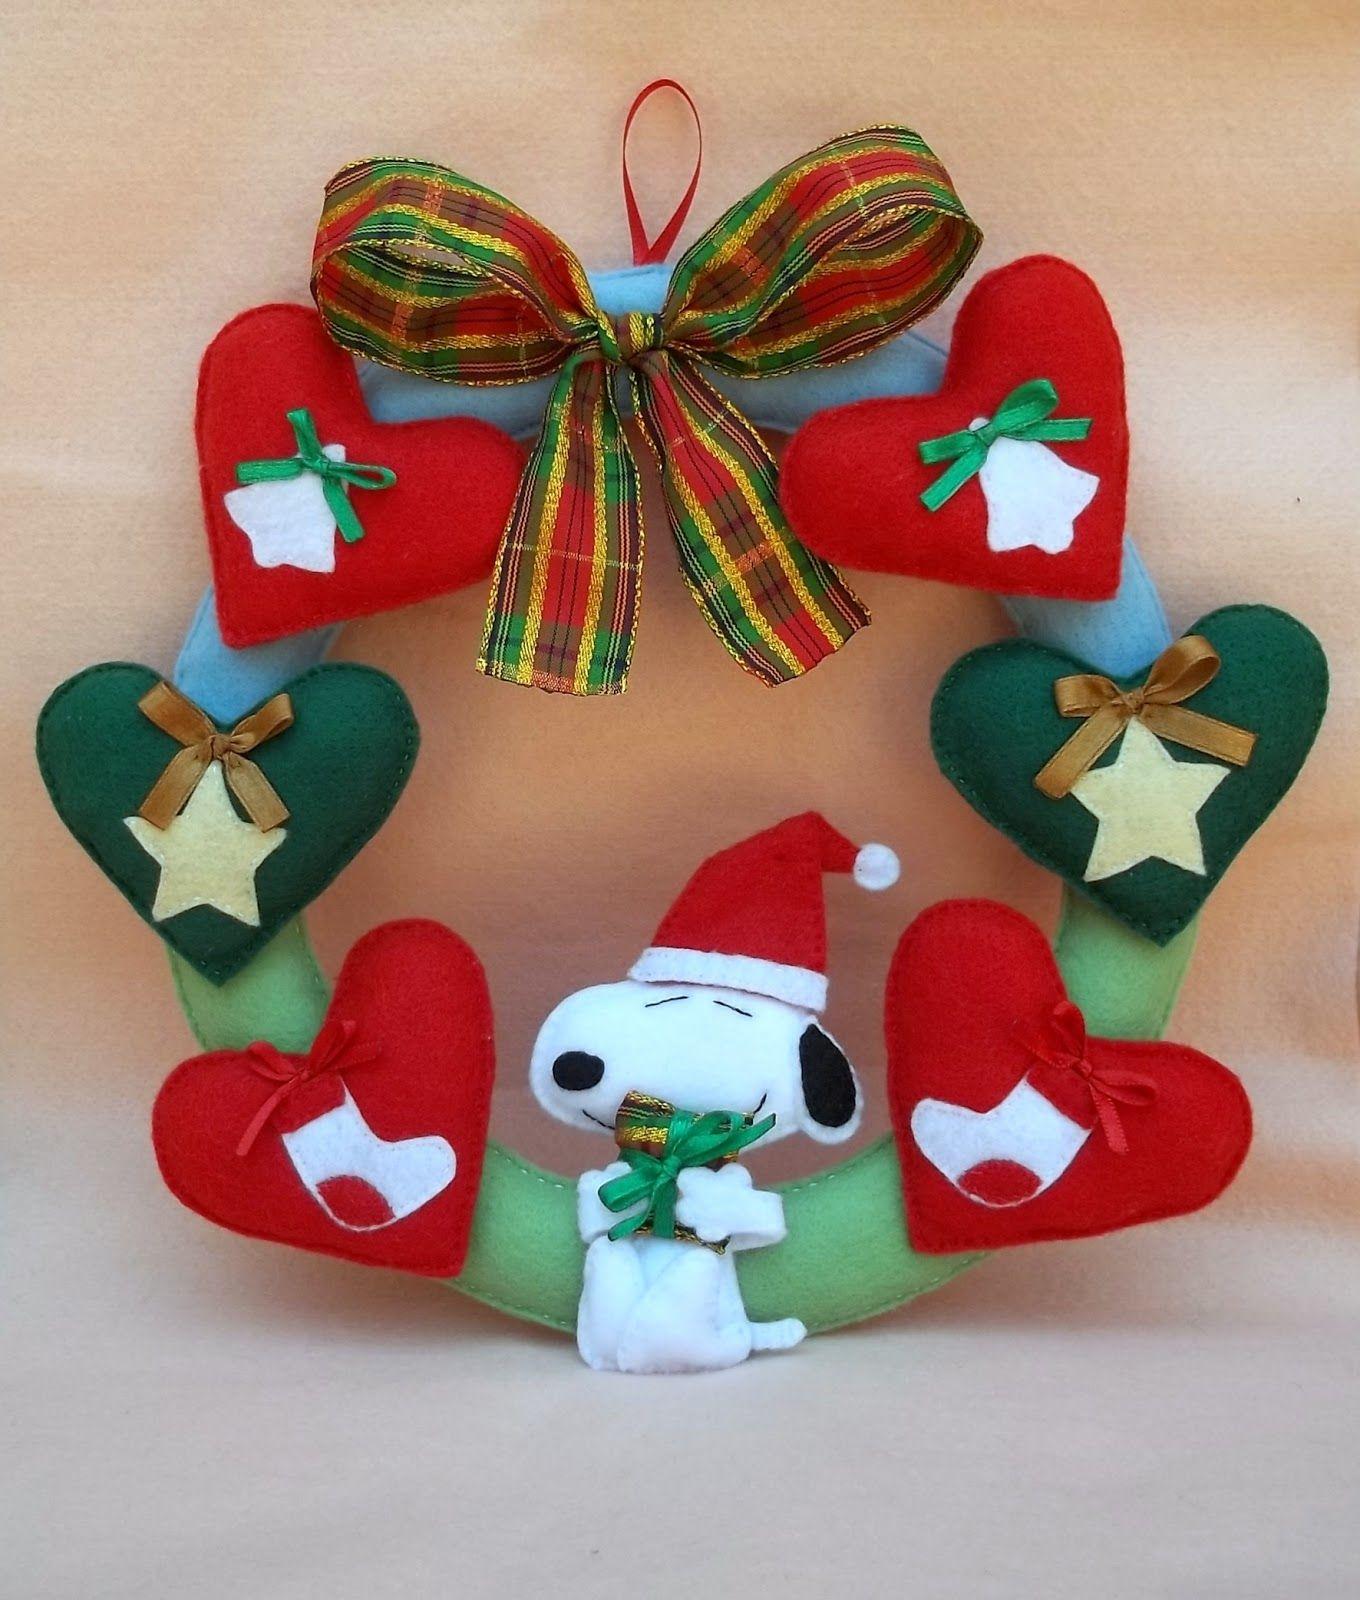 moldes de guirlandas de natal - Bing Imagens